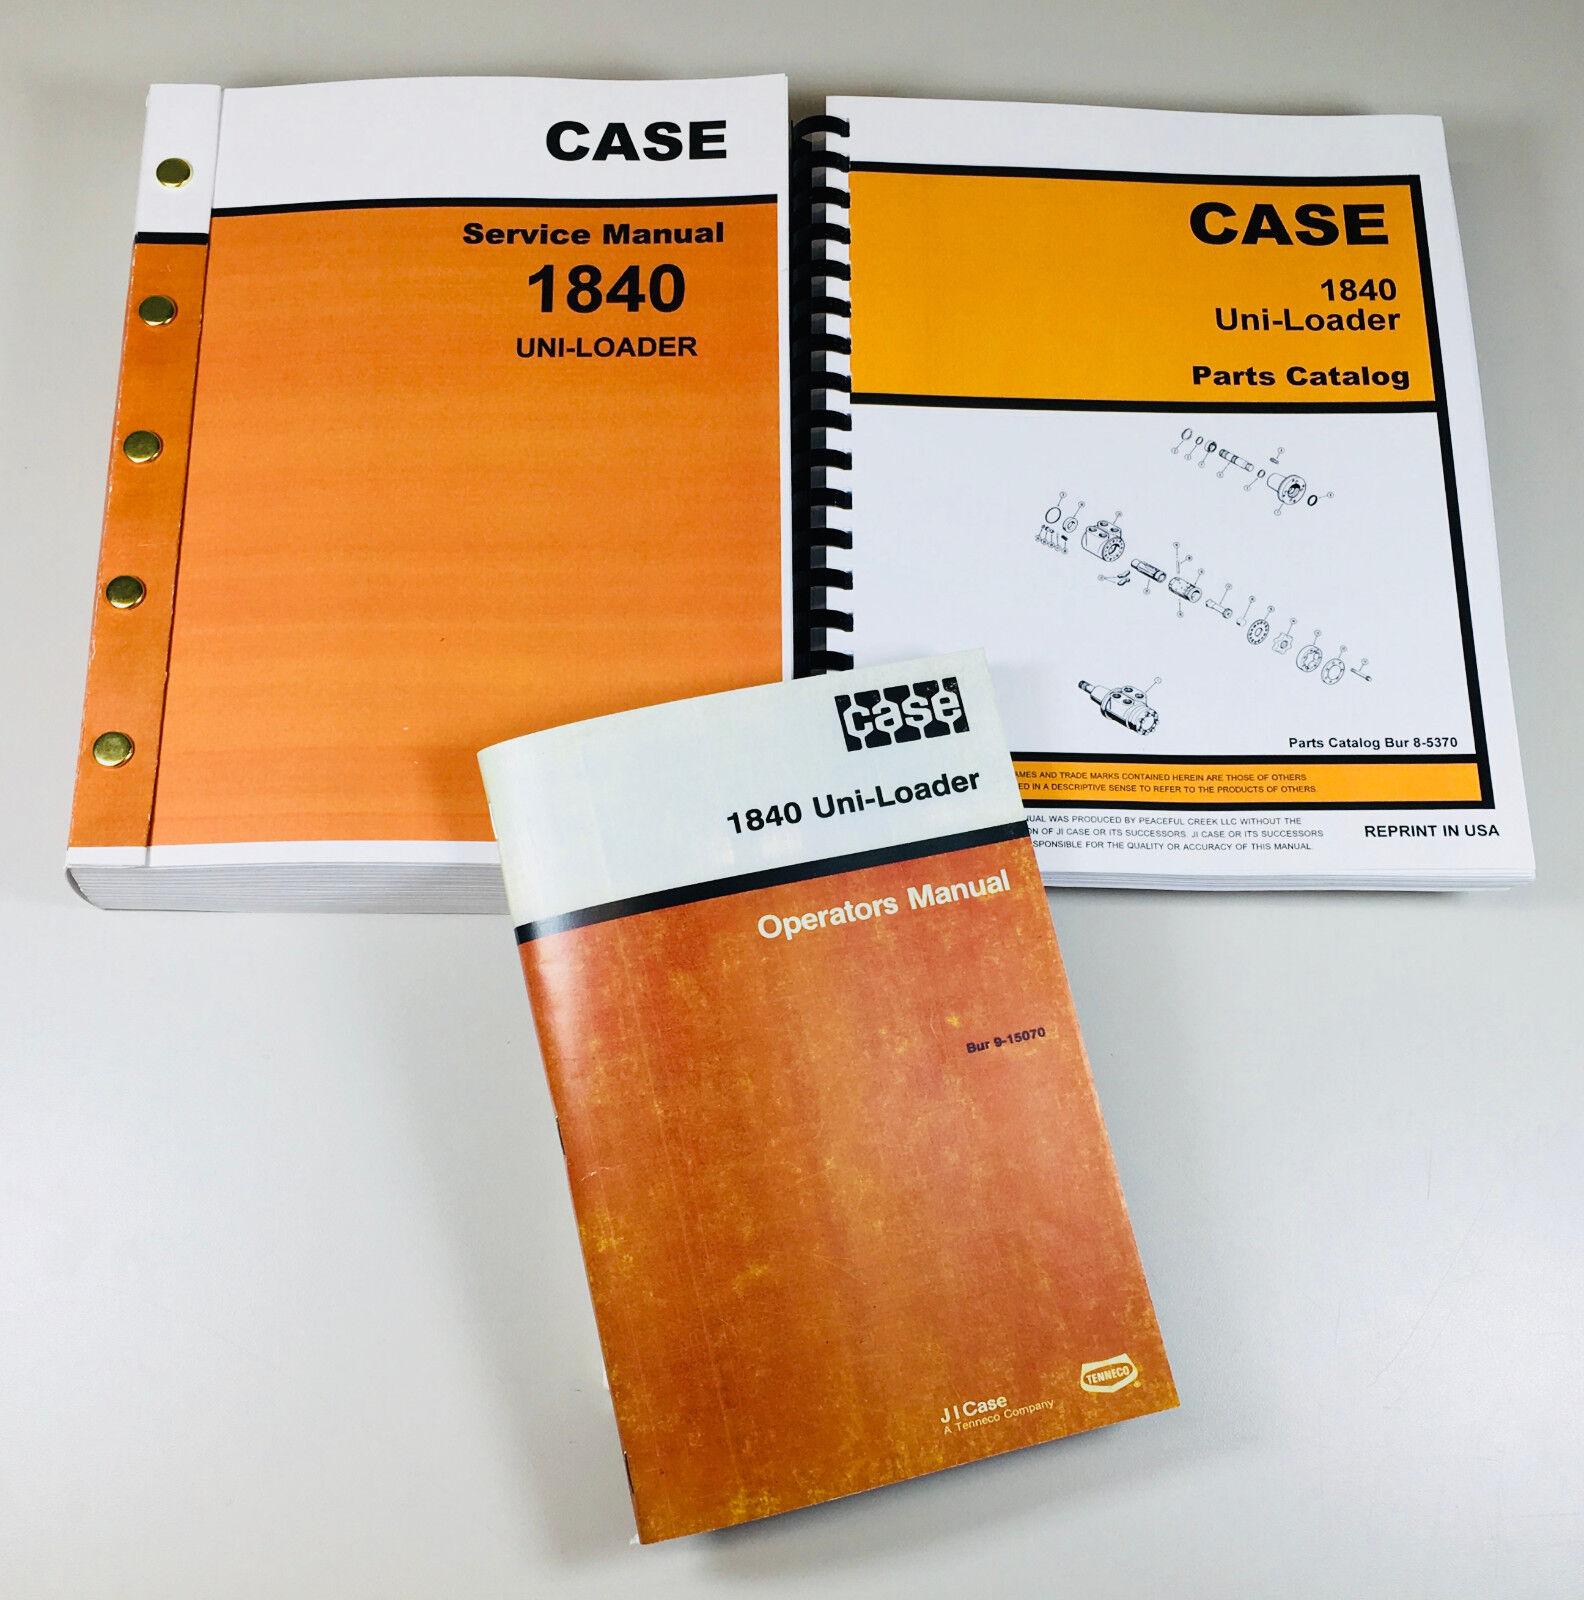 Complete Service Repair/Overhaul/Parts/& Operators Manuals